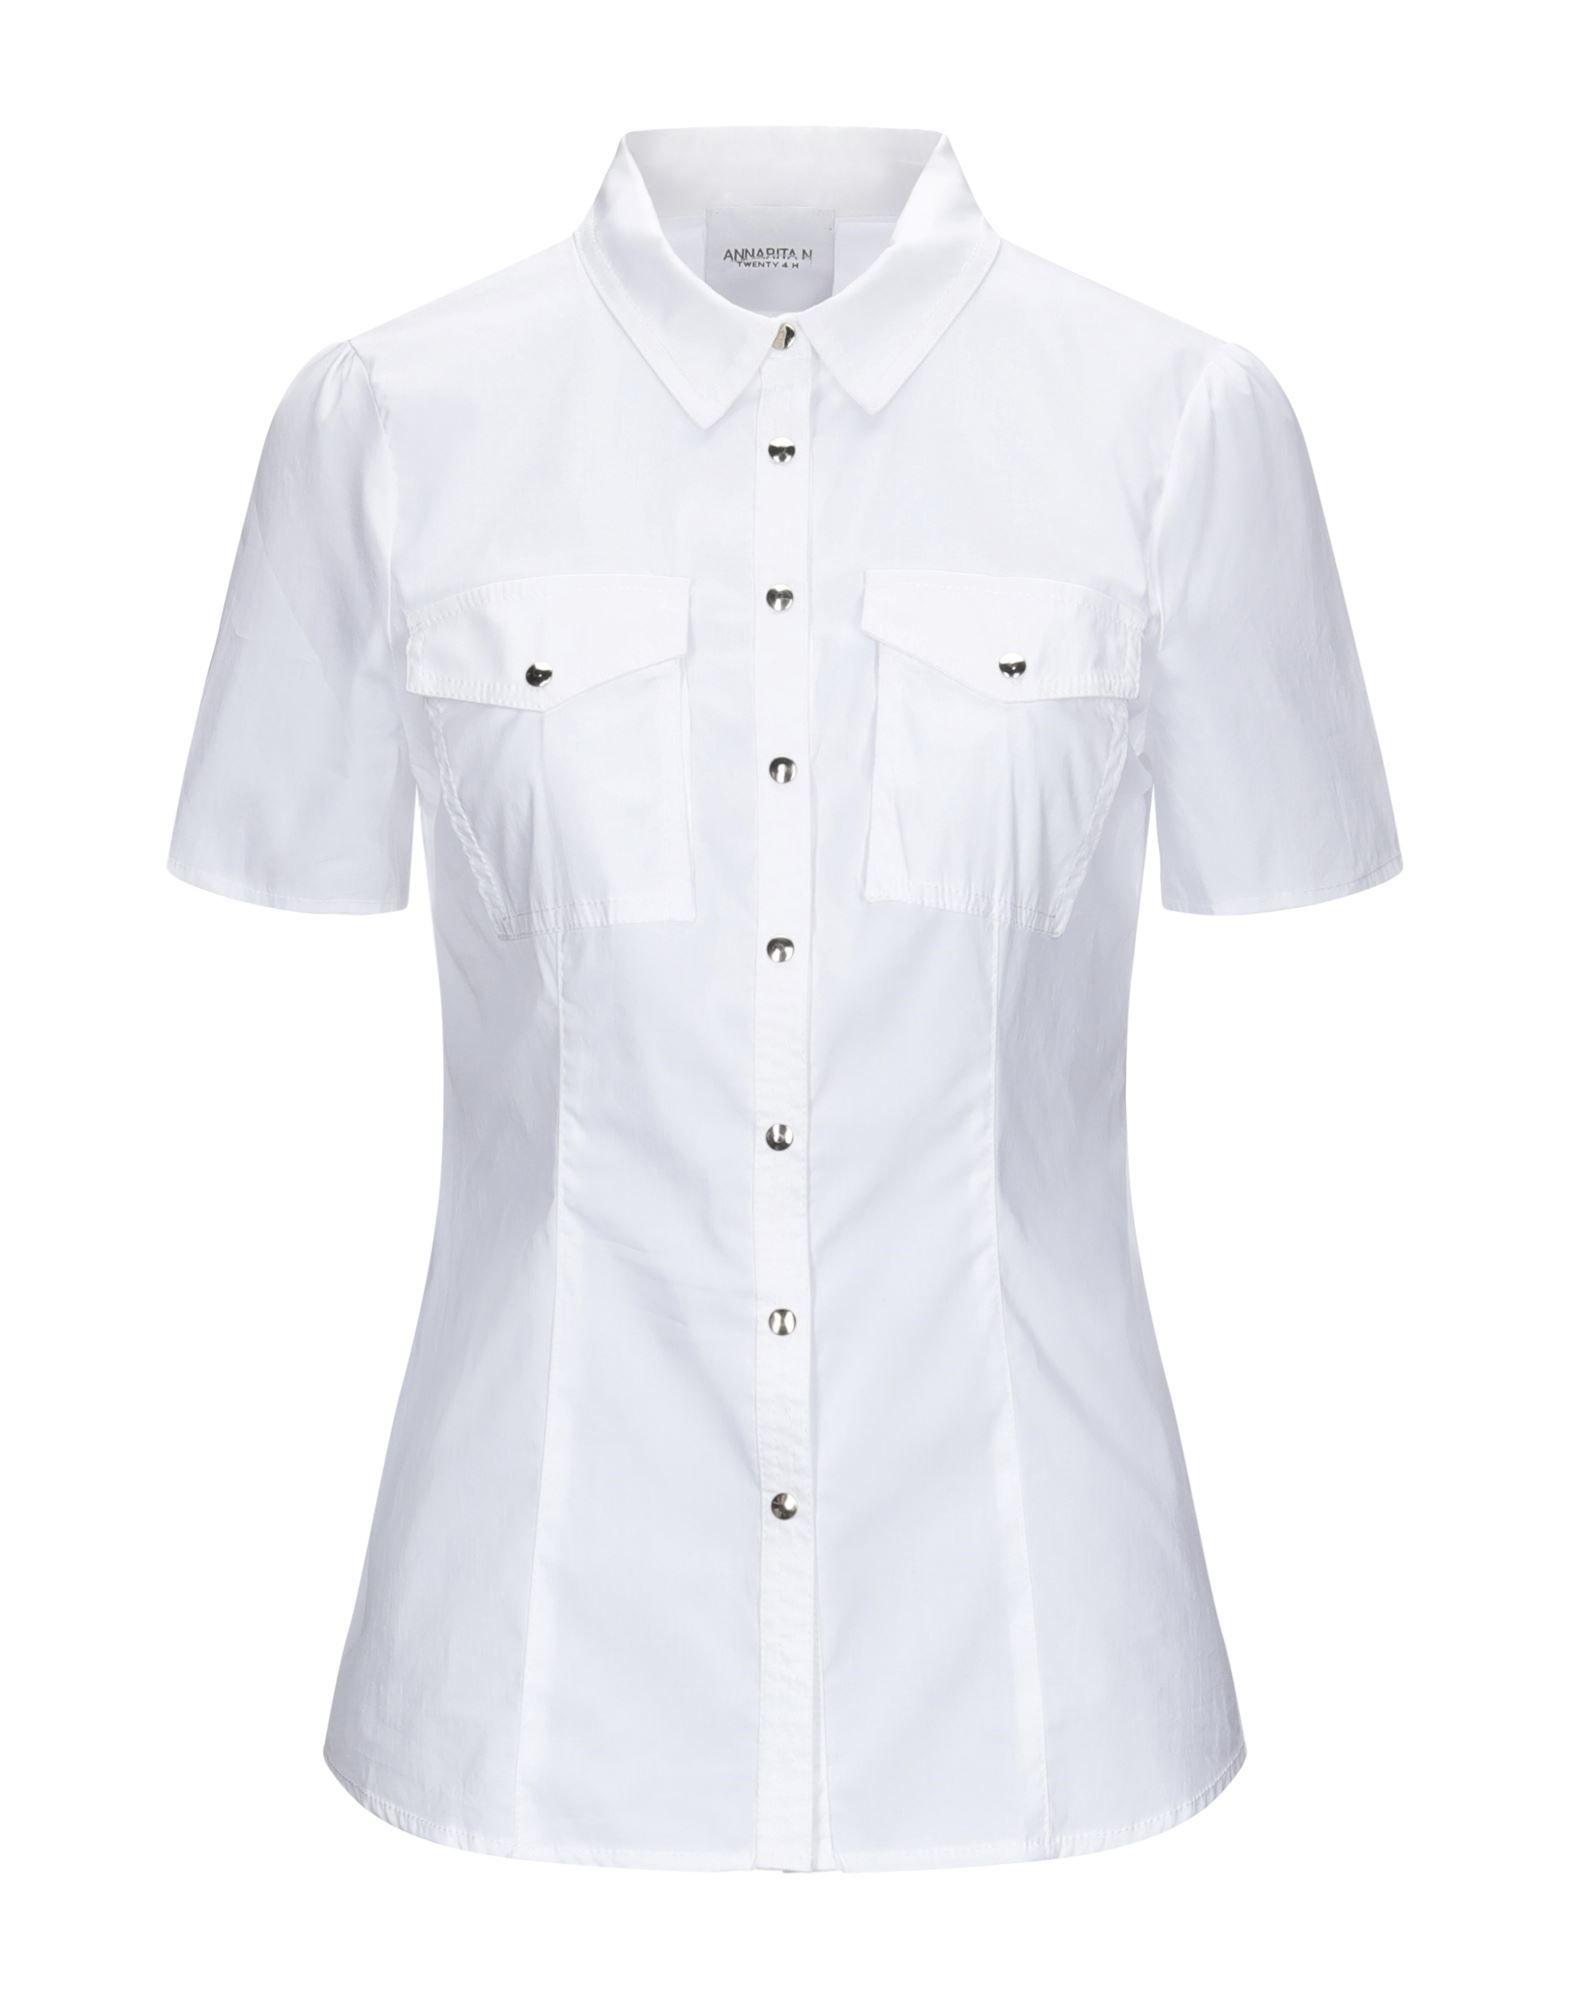 Annarita N Twenty 4H Women's Shirts Cotton